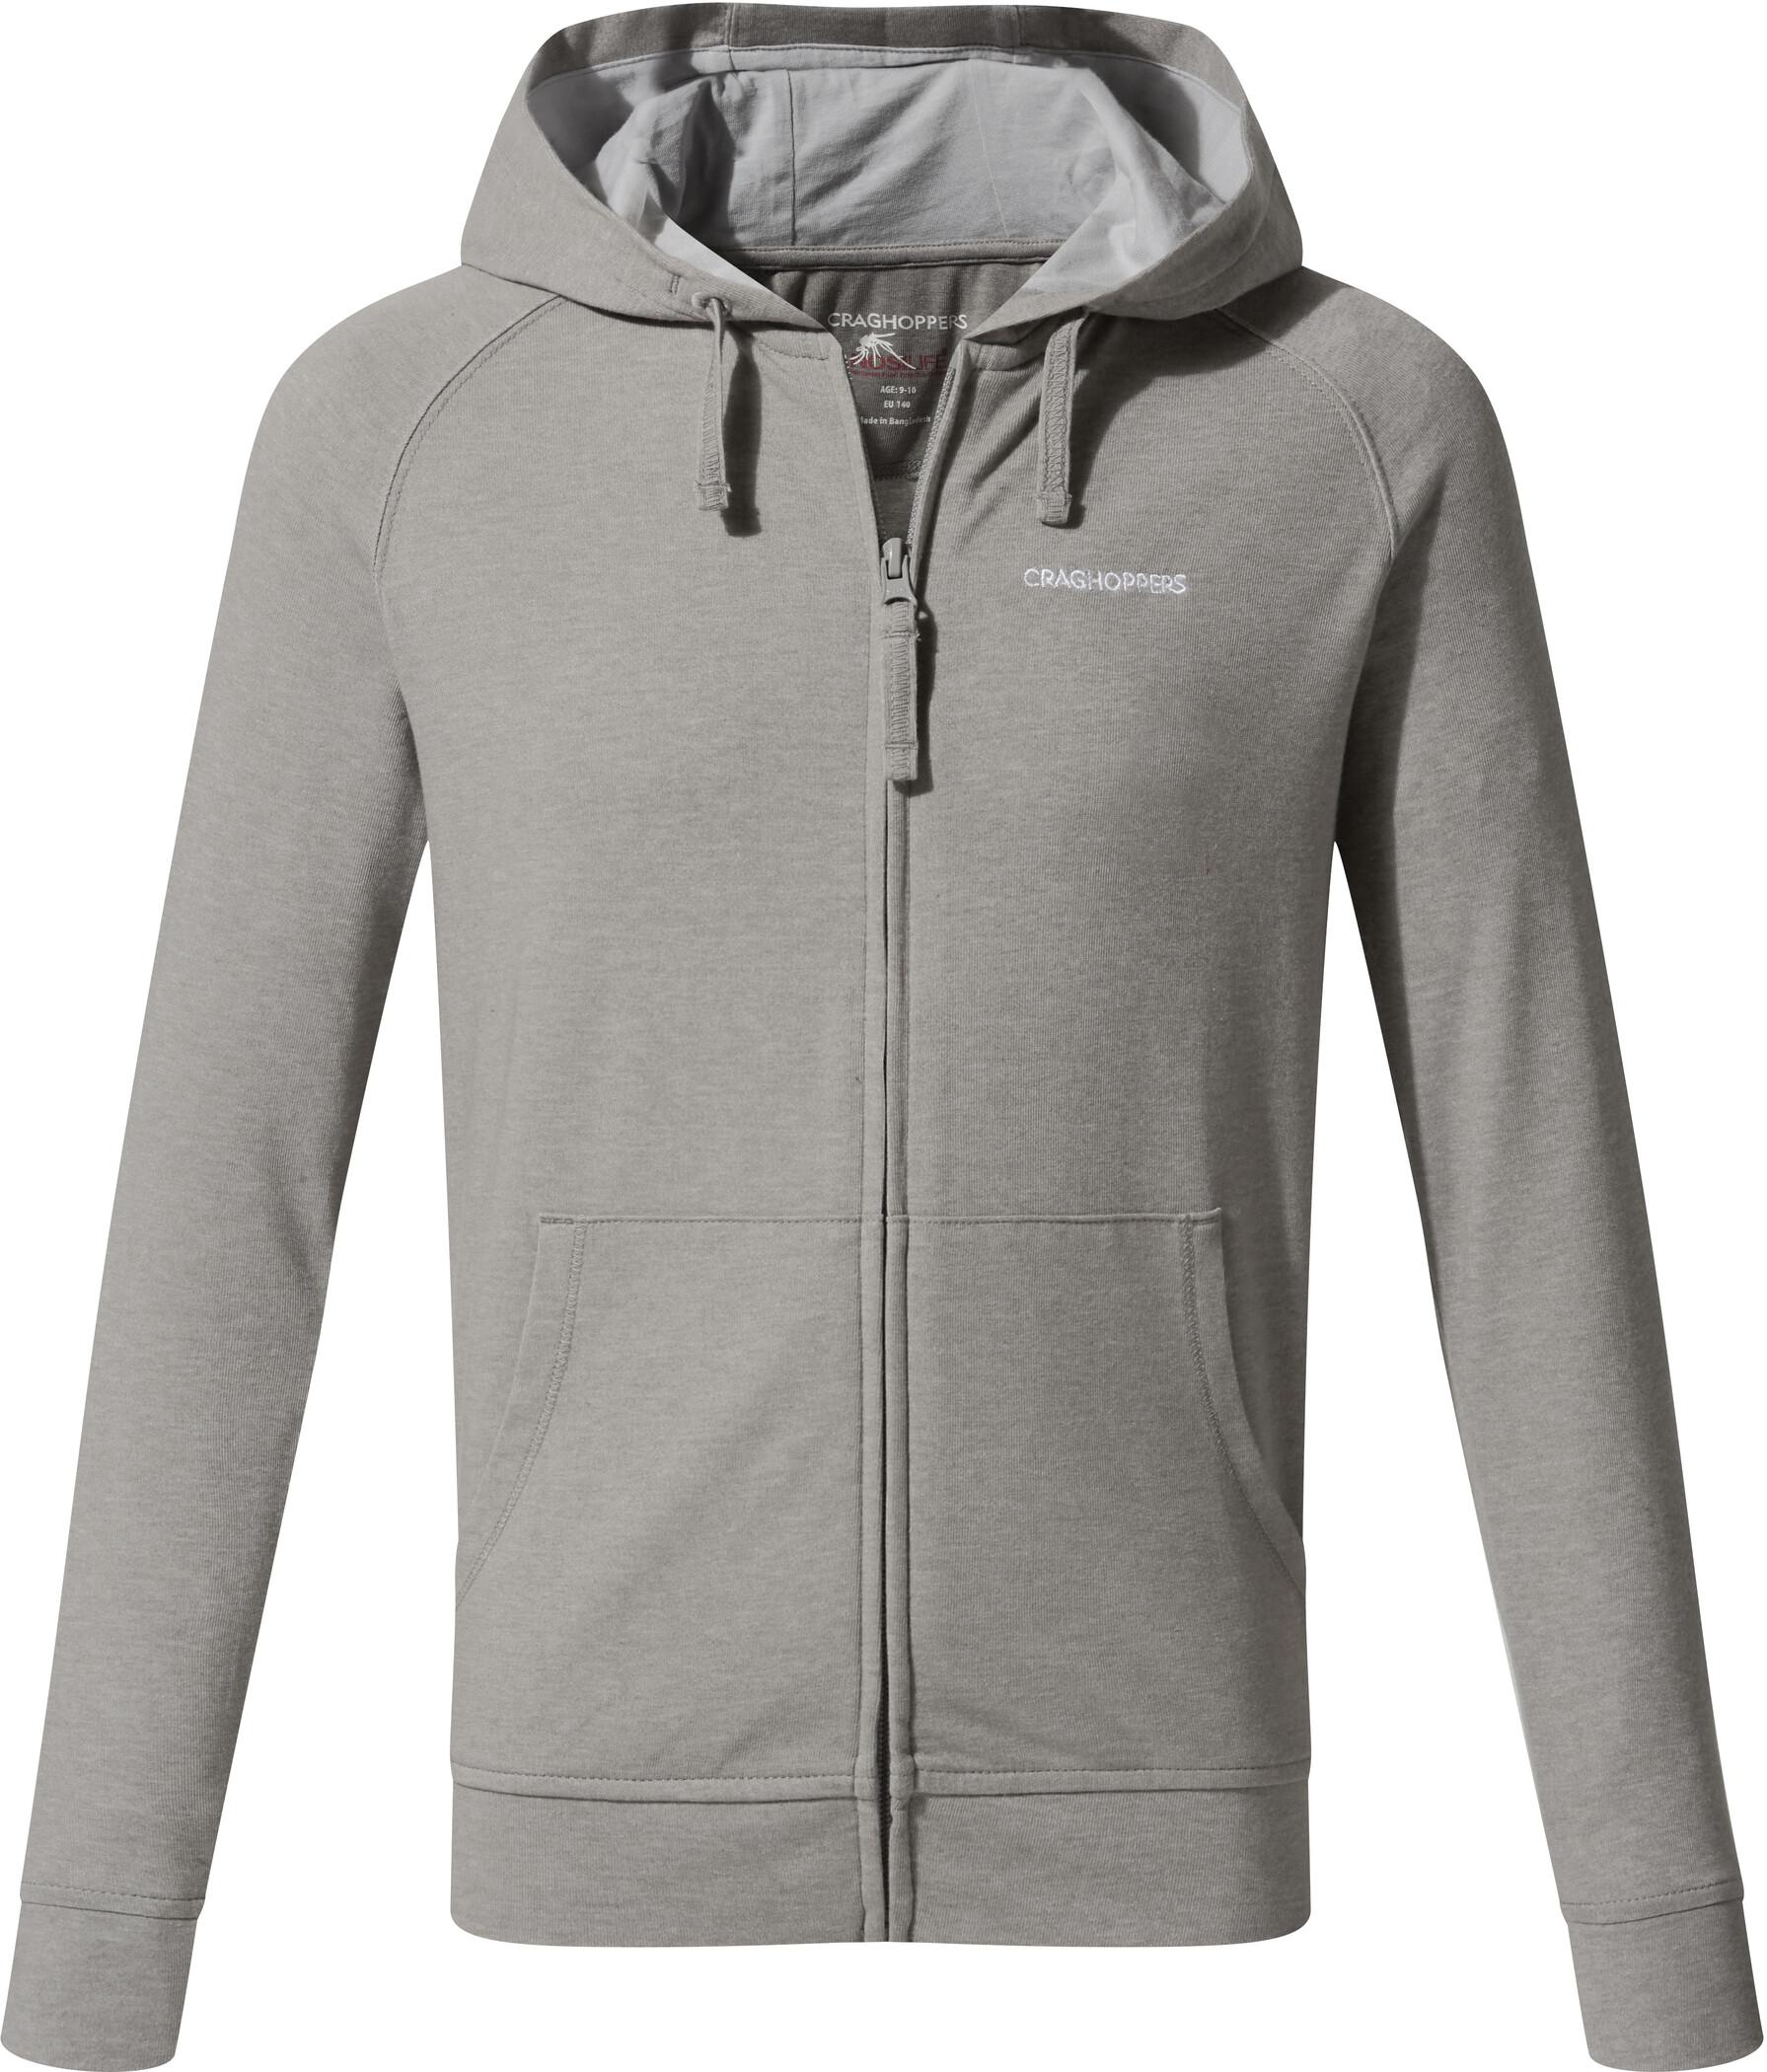 Veta Megica Mens Fashion Hoodies Black Busch 18 Logo Casual Sweatshirt